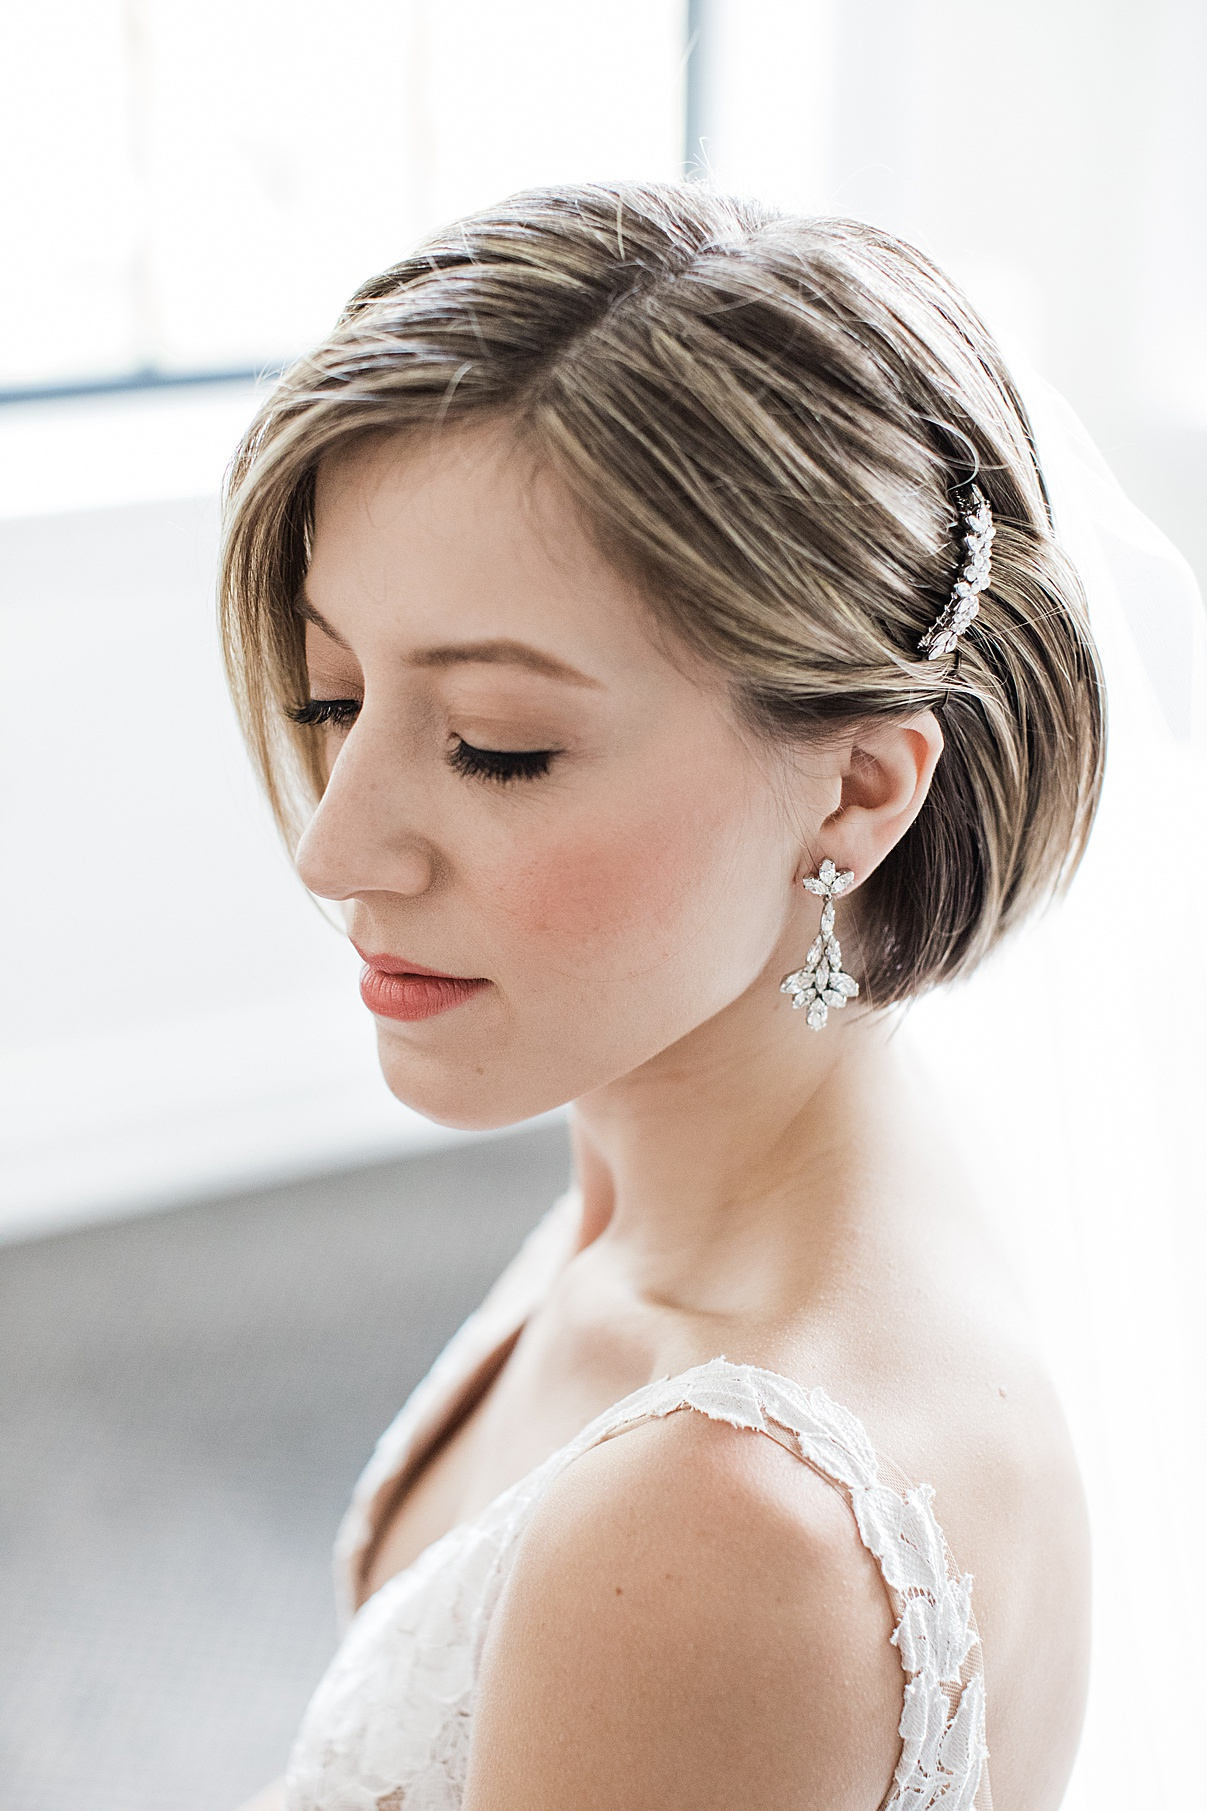 Bridal portrait earrings and makeup| Harding Waterfront Estate Wedding| Ontario wedding photographer| Toronto wedding photographer| 3 Photography | 3photography.ca